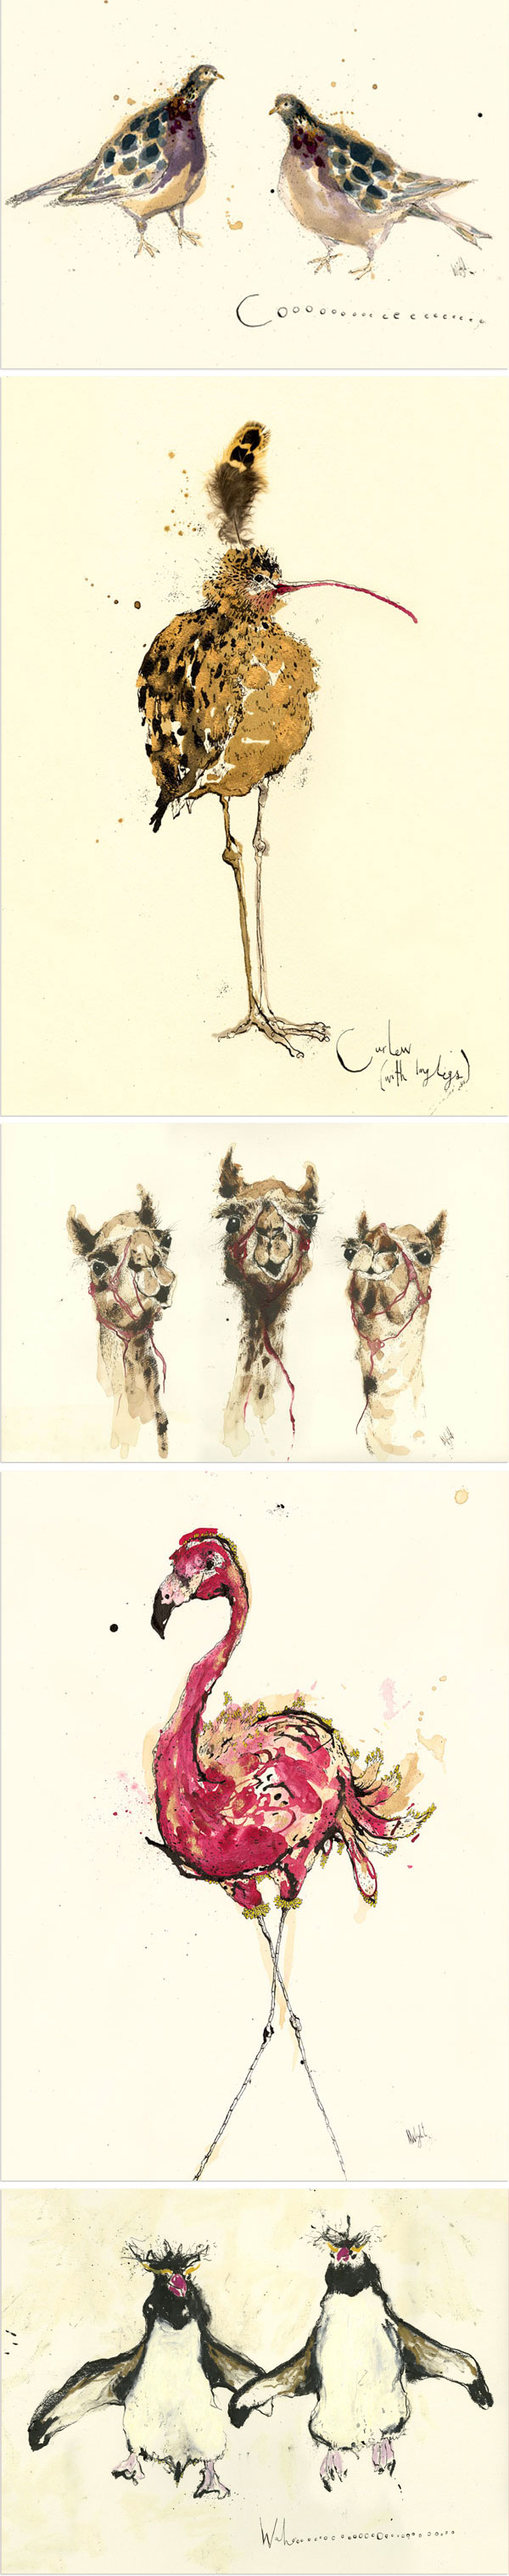 LieblingsProdukte: Anna Wright - Wunderbare Illustrationen